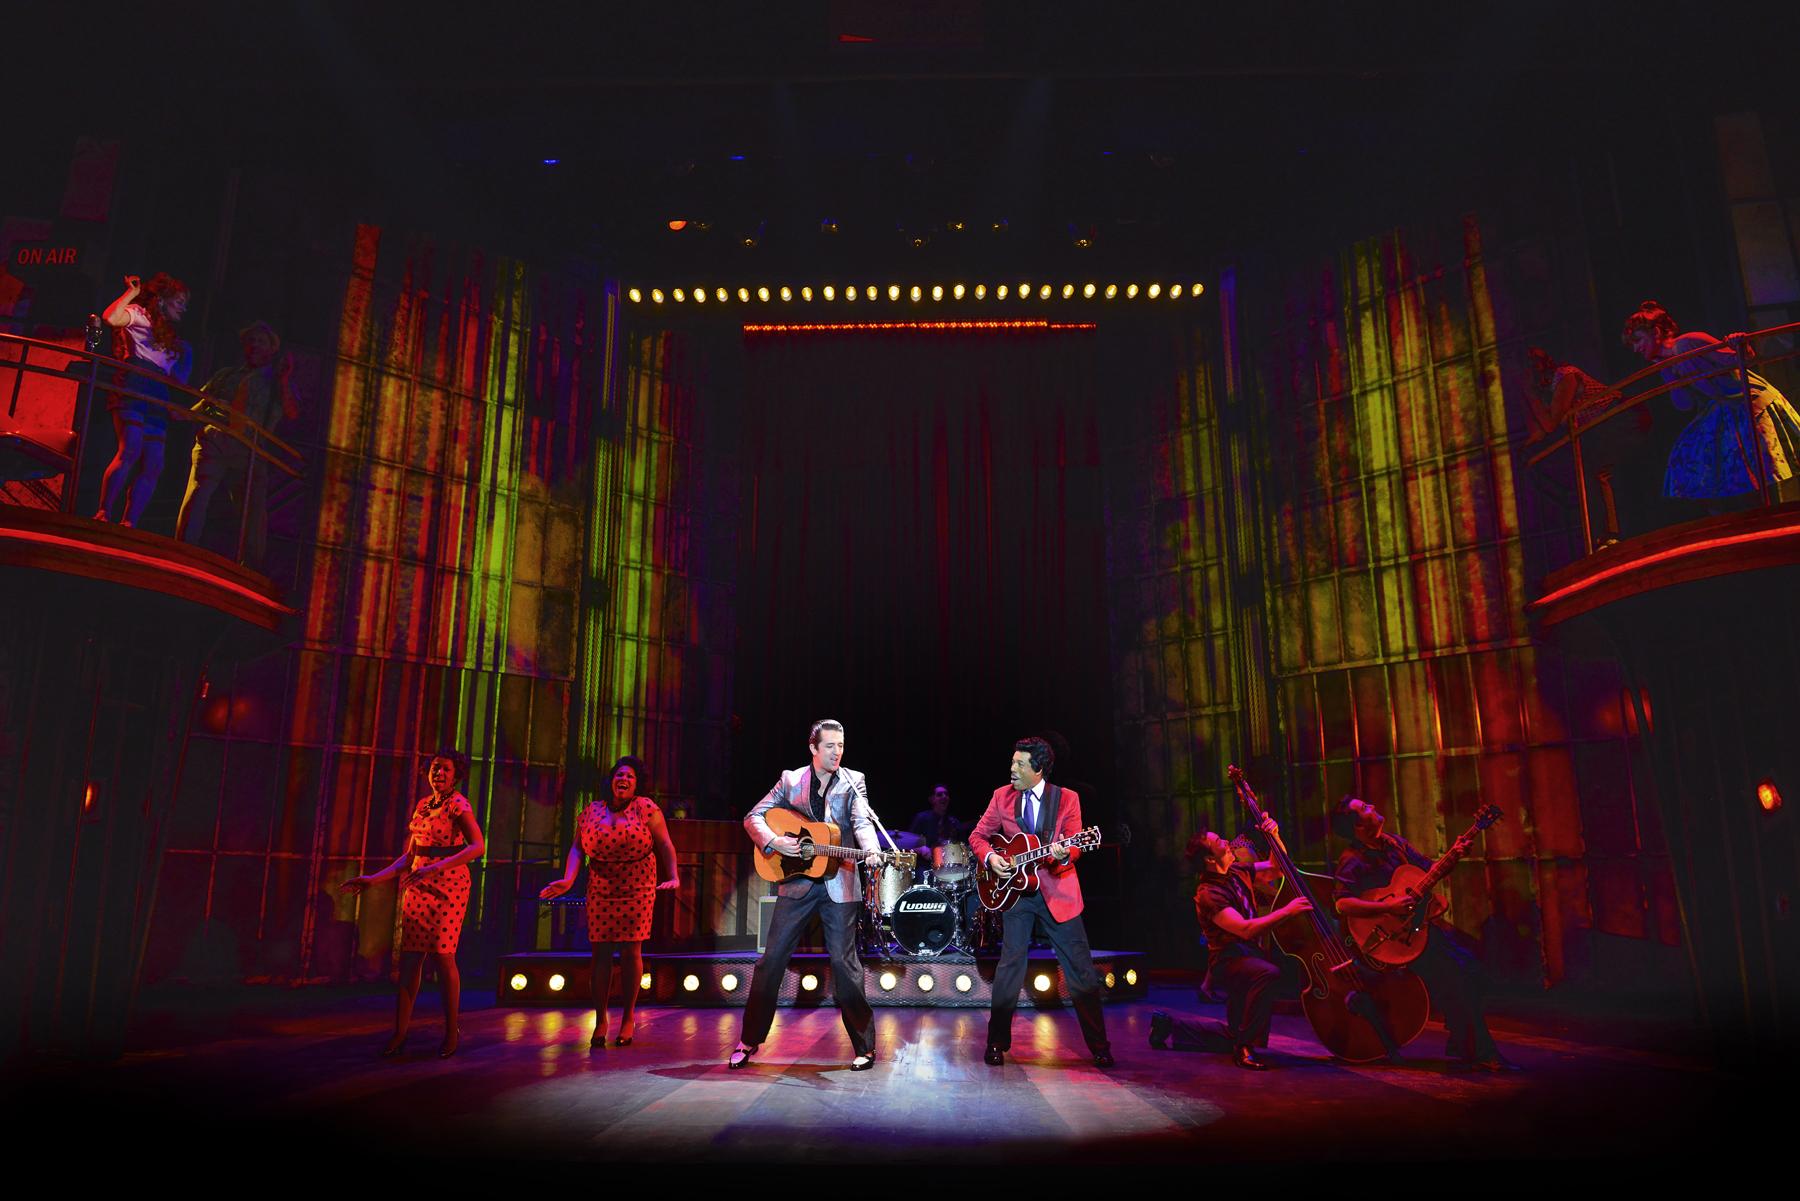 BWW Review: HEARTBREAK HOTEL at Ogunquit Playhouse